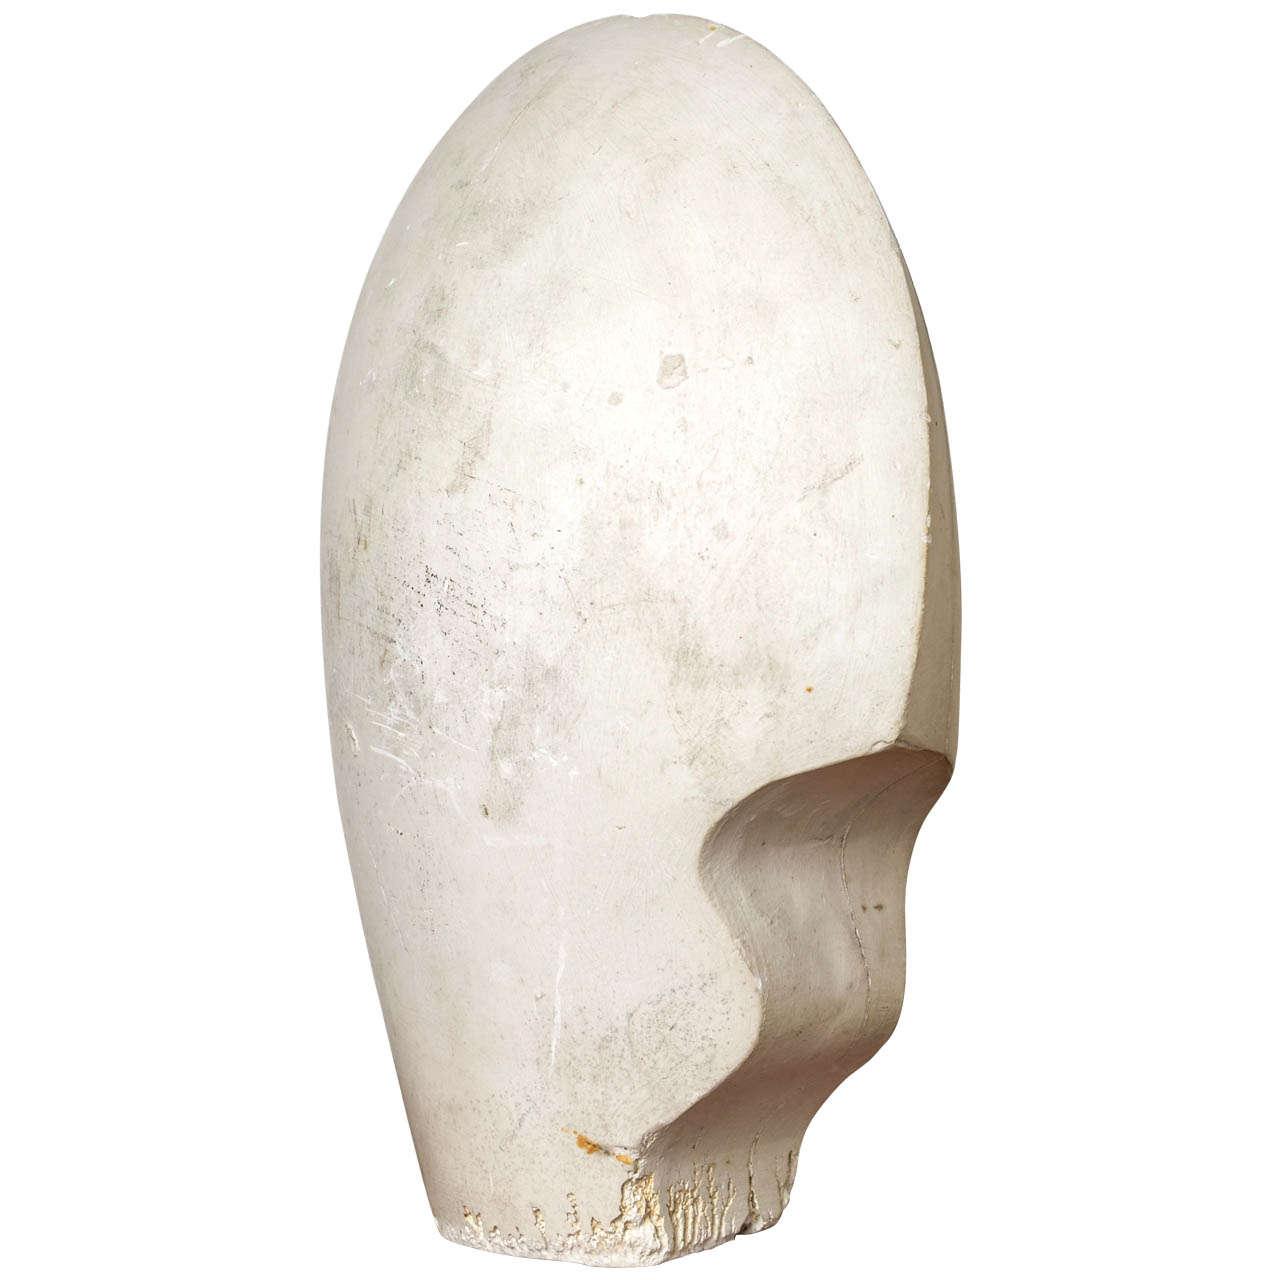 Jean Hans Arp, Great helm head (Tête de heaume)